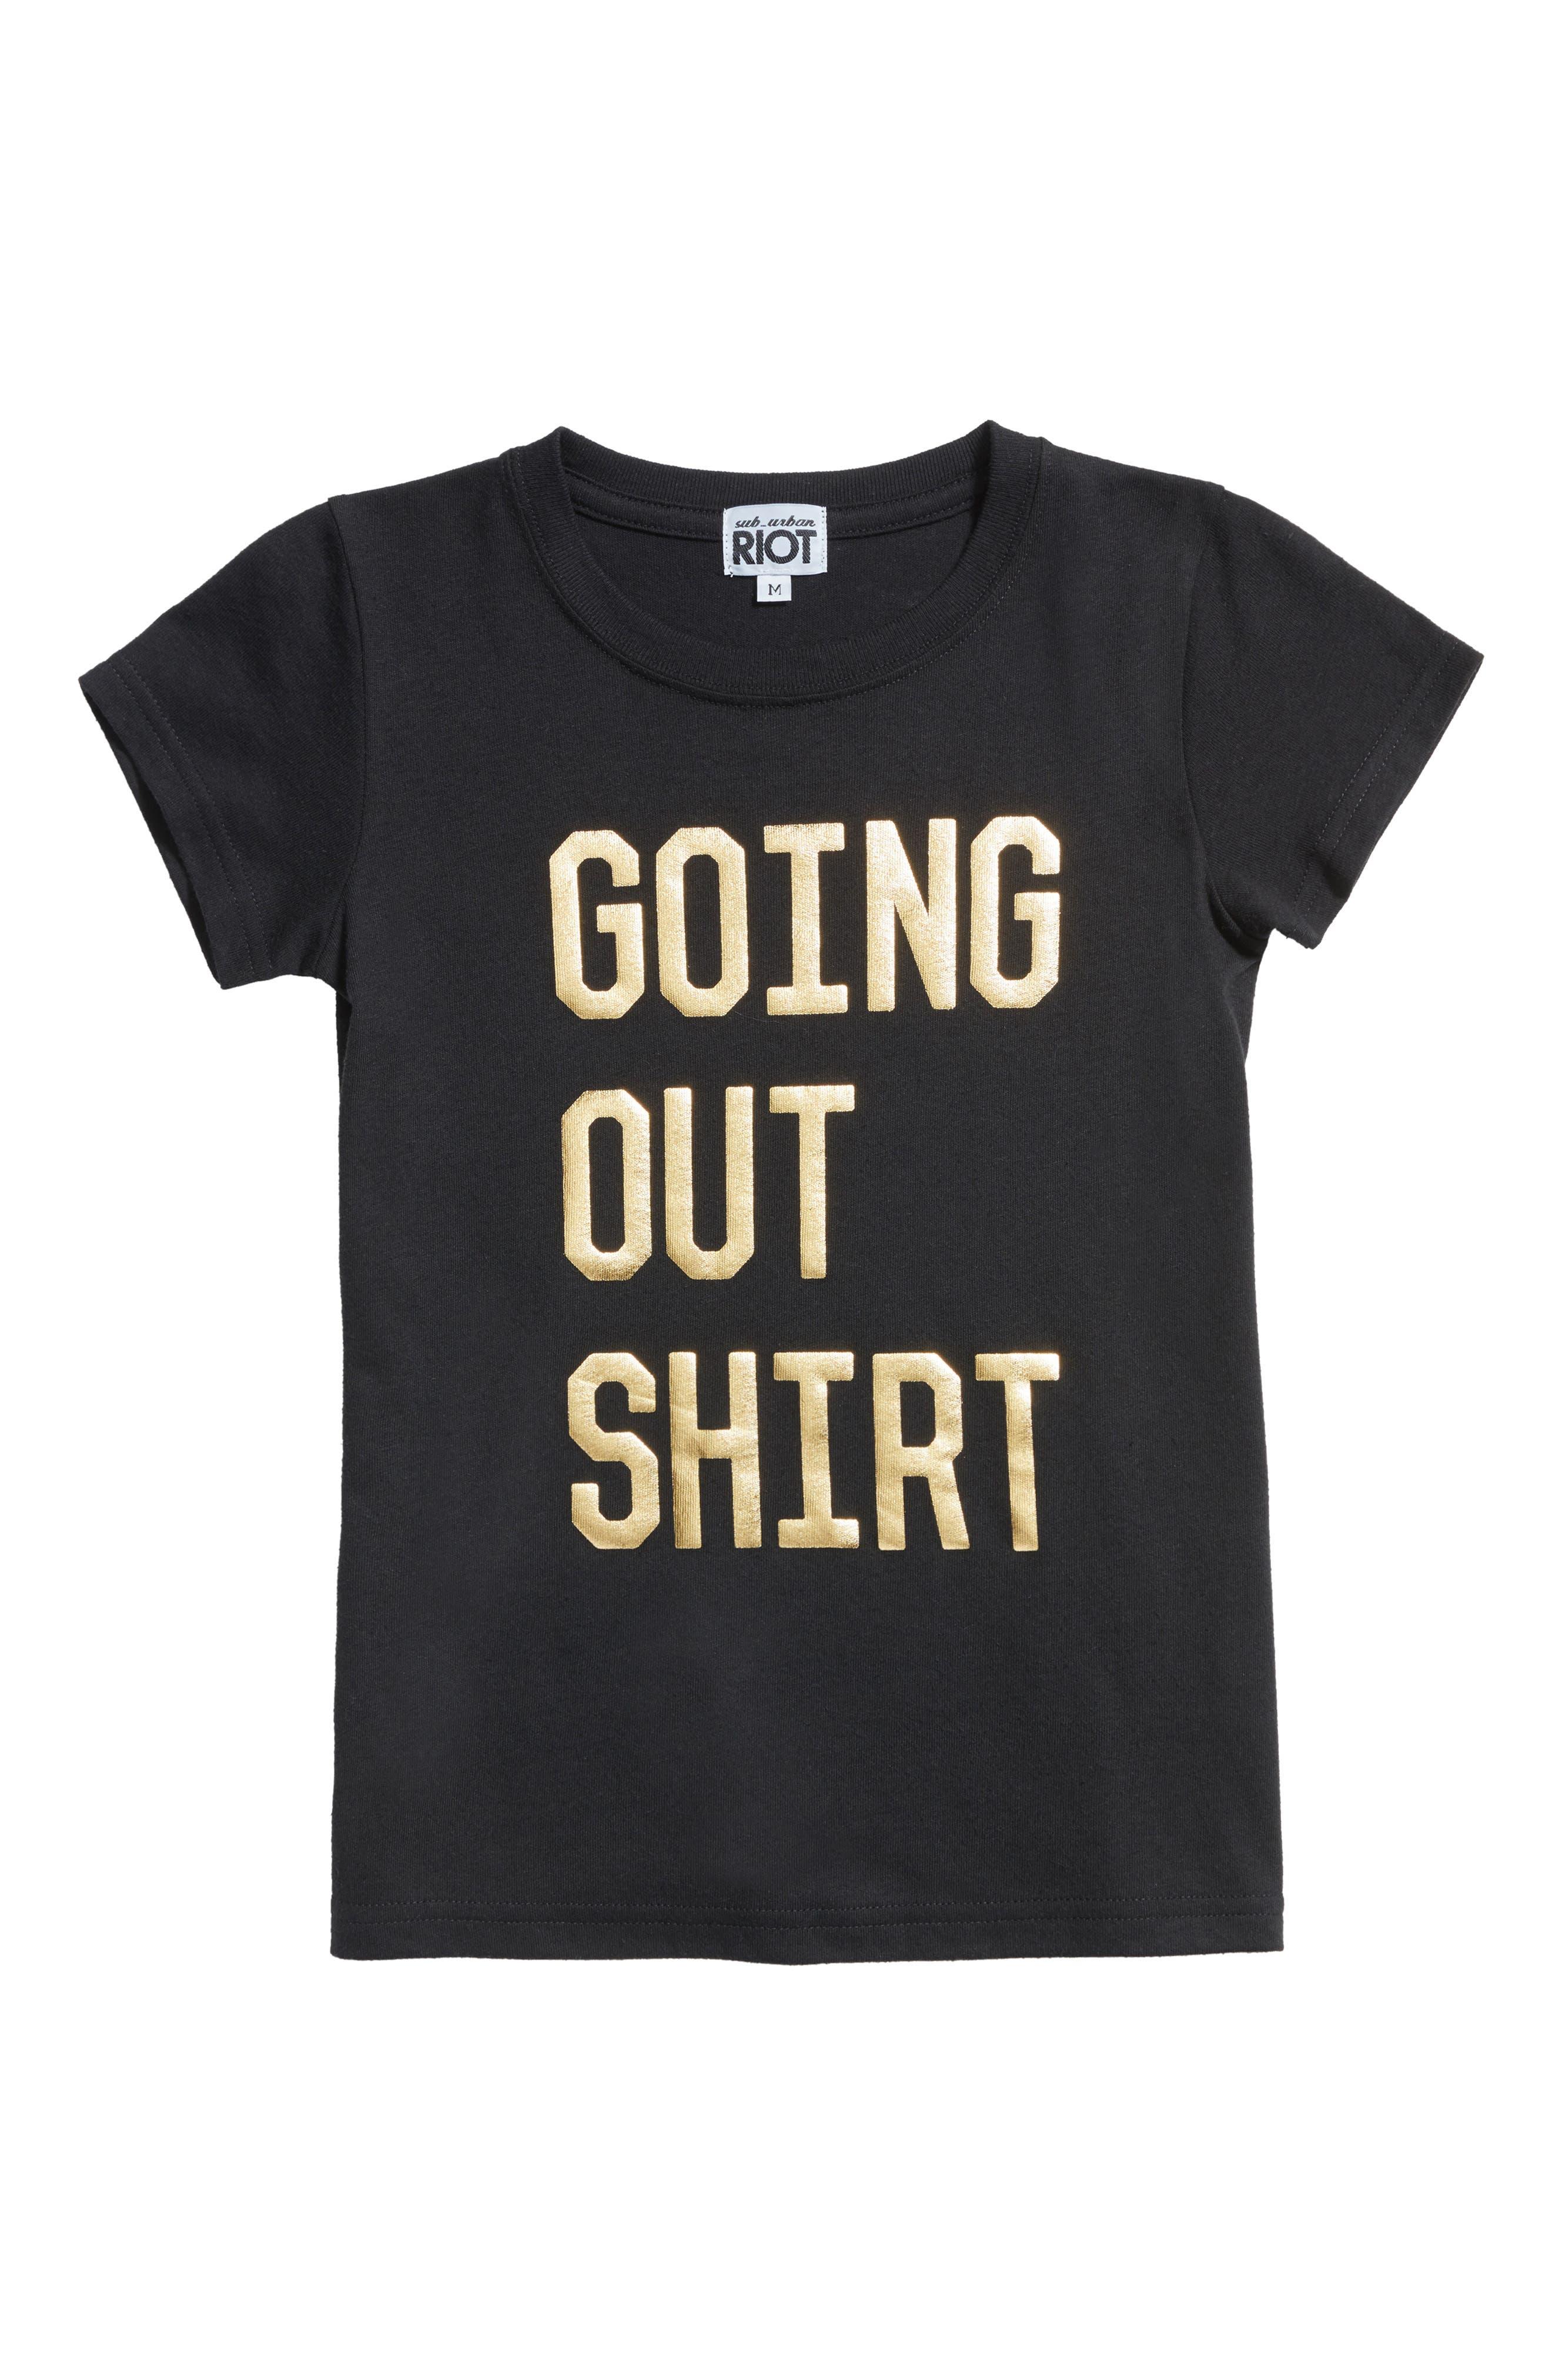 Sub_Urban Riot Going Out Shirt Tee (Big Girls)